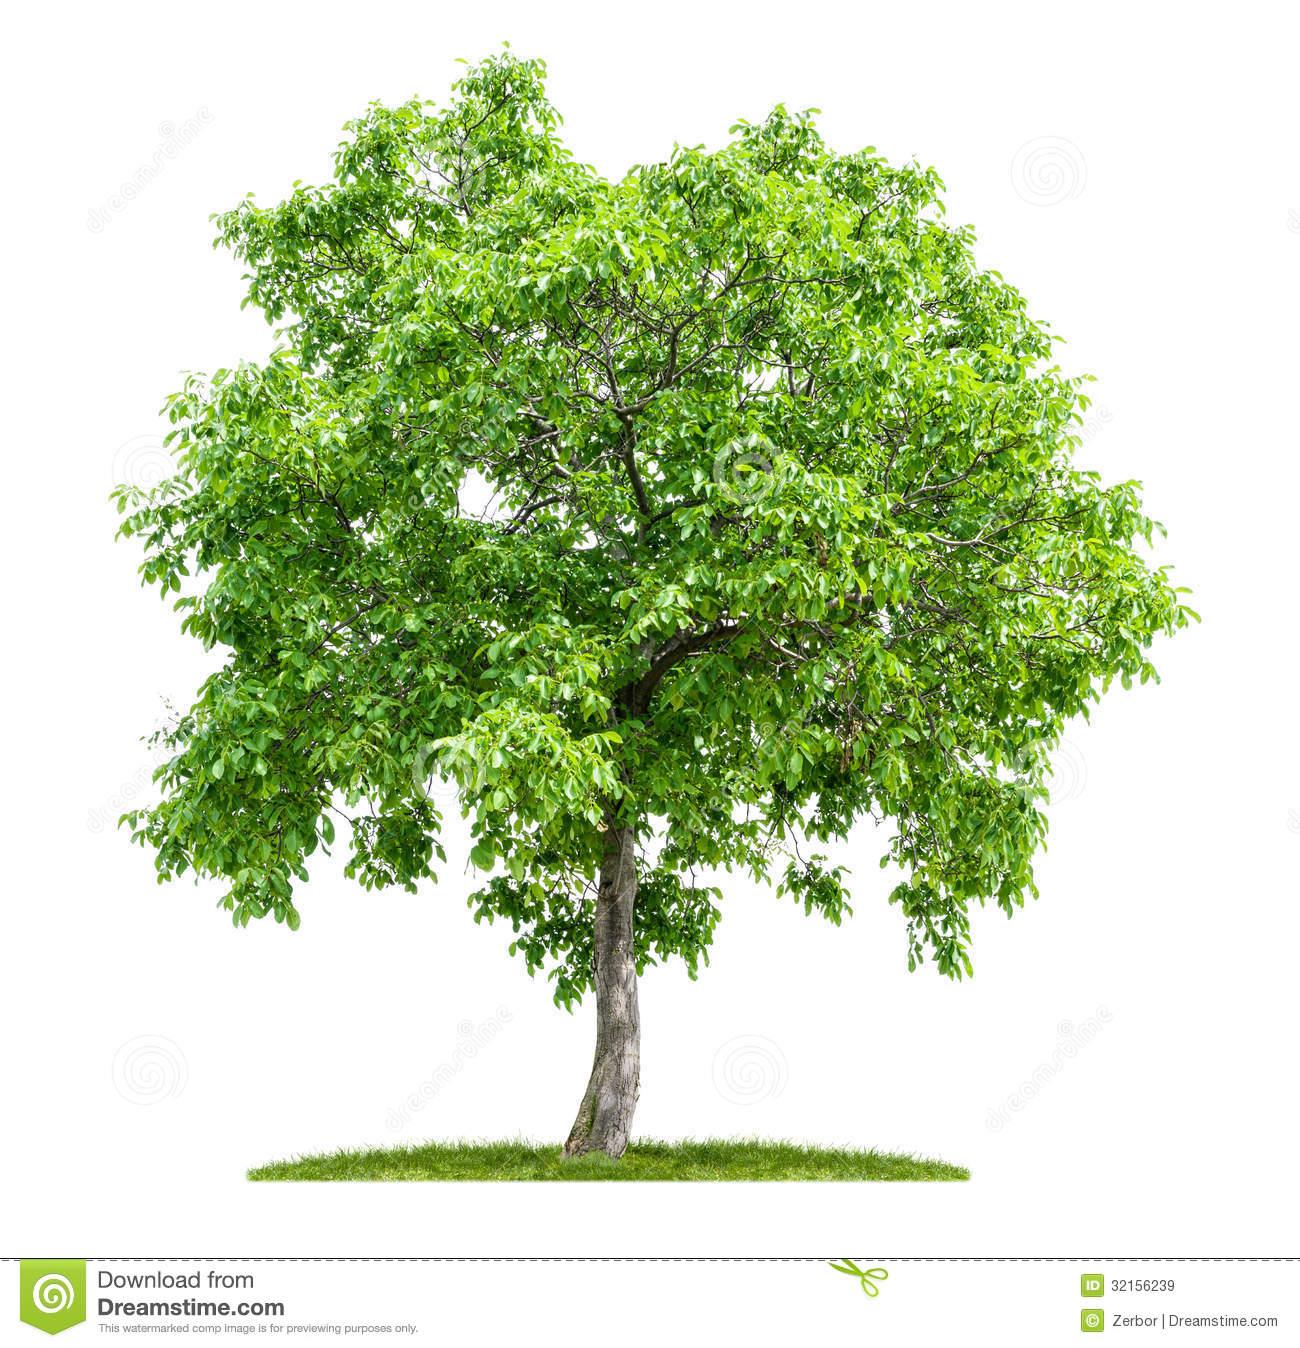 Walnut tree clipart clipart.